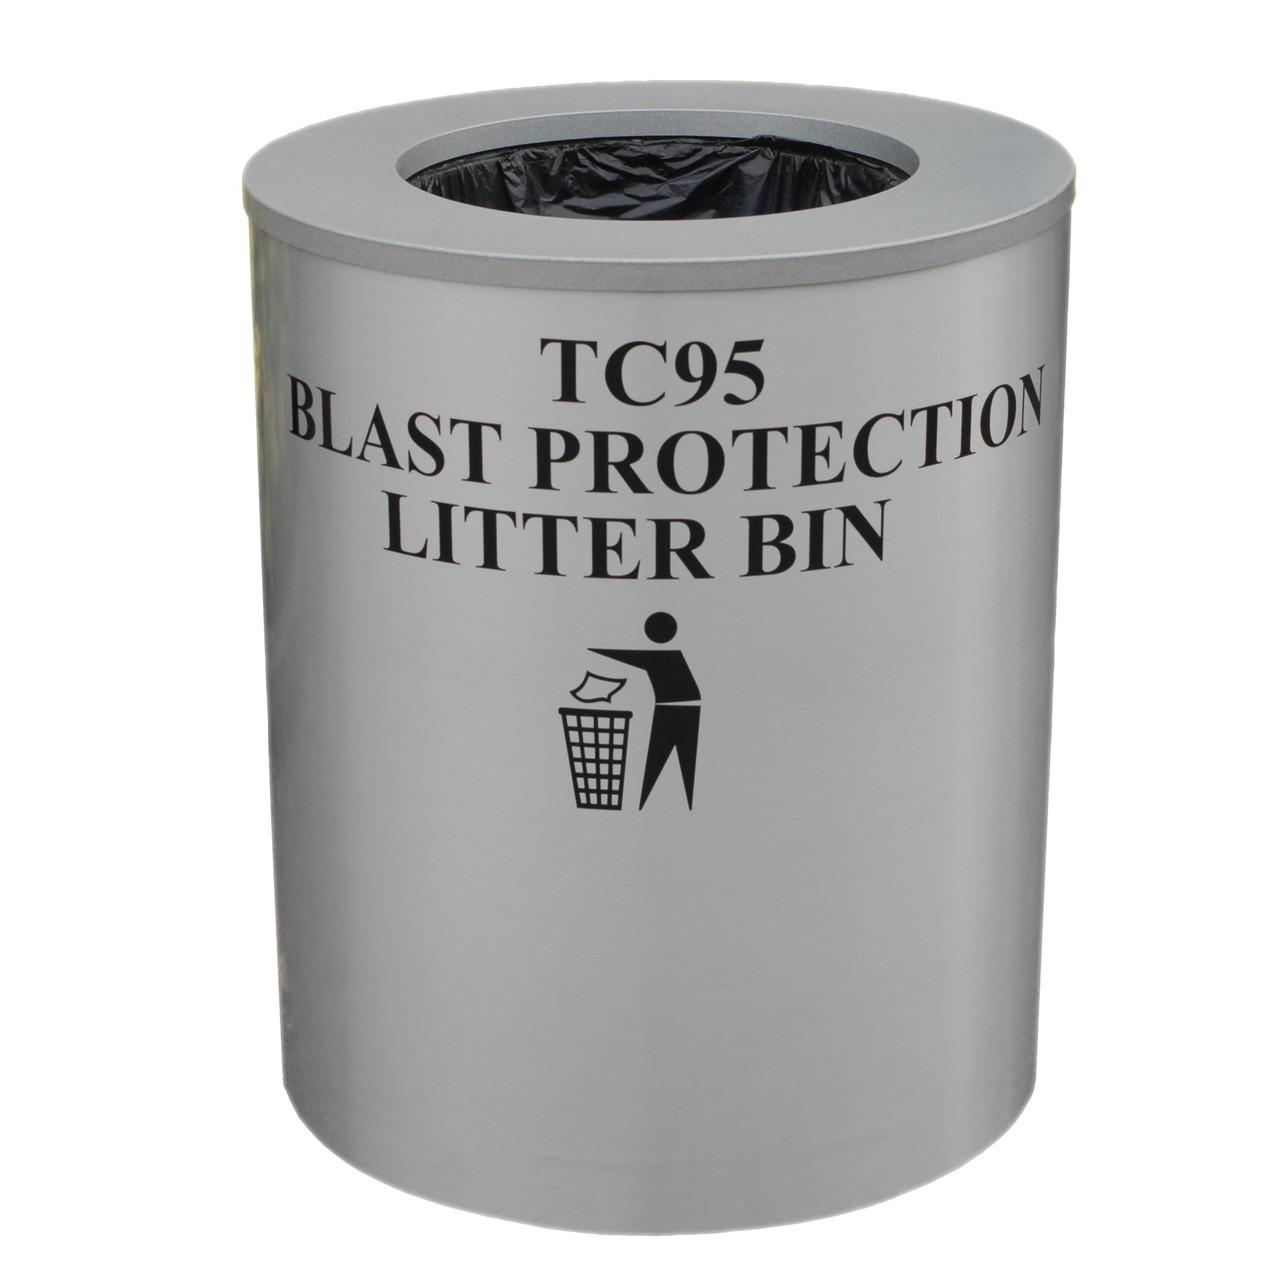 TC95 grey metal blast resistant litter bin